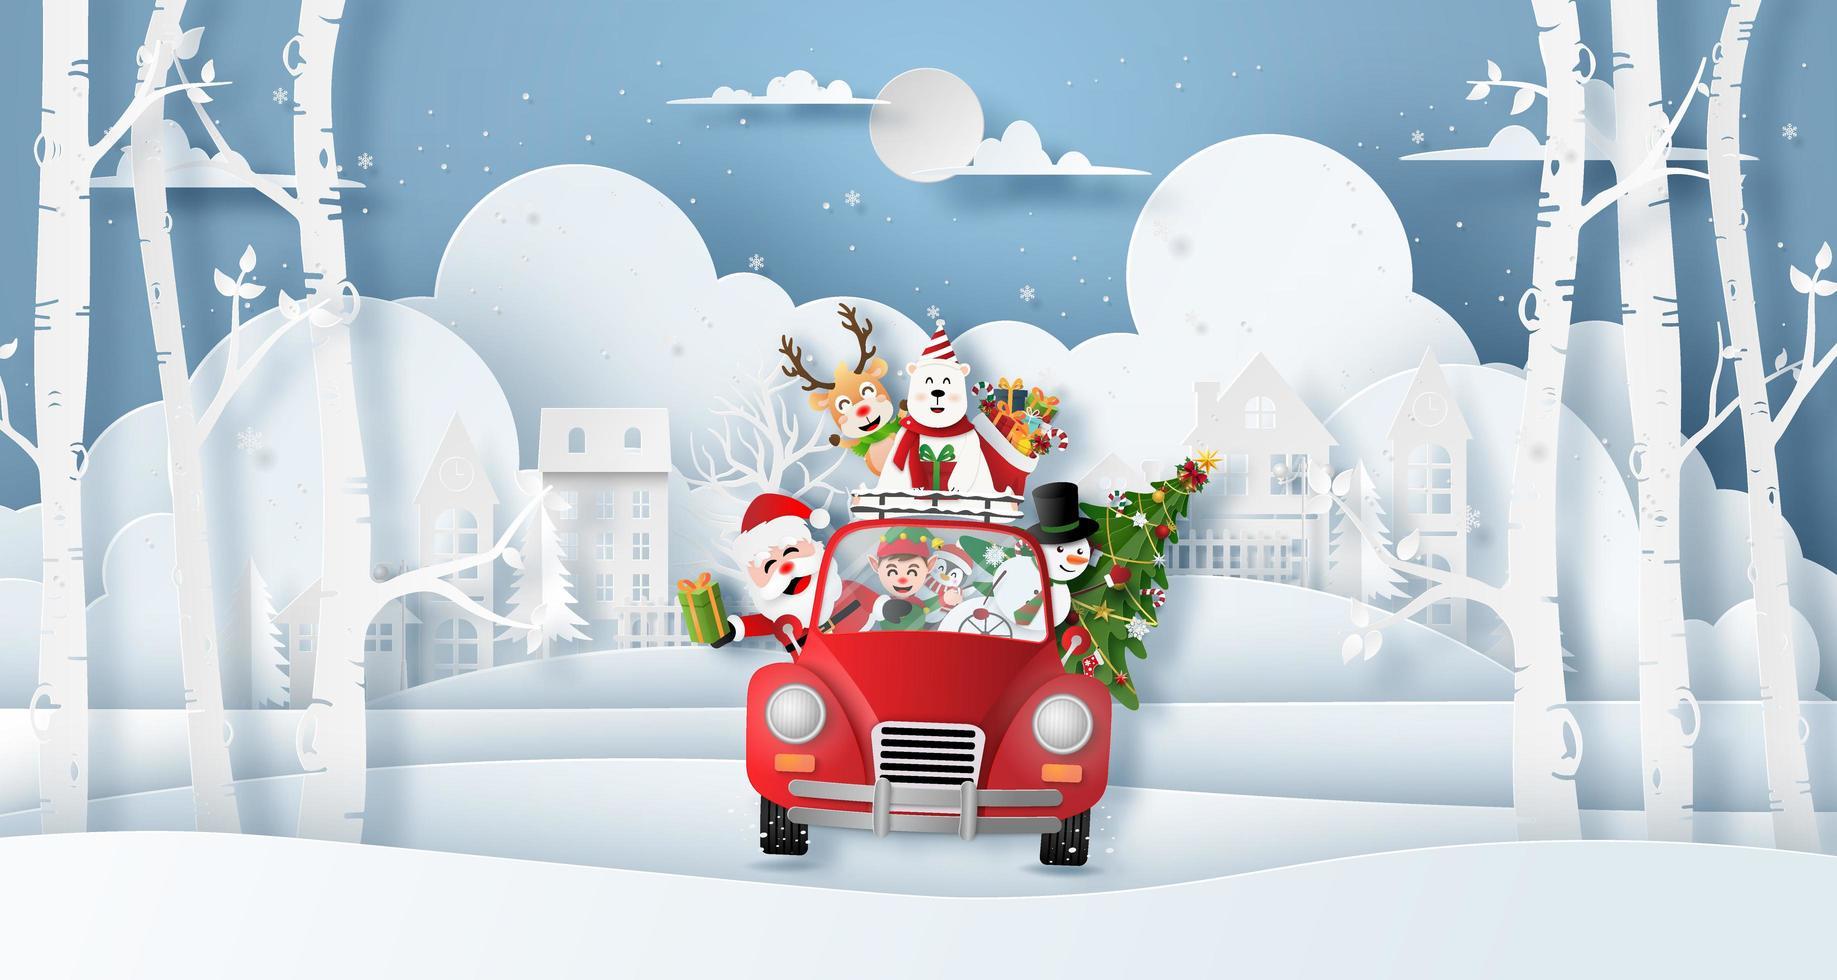 Christmas friends with Santa in car exploring Christmas village vector